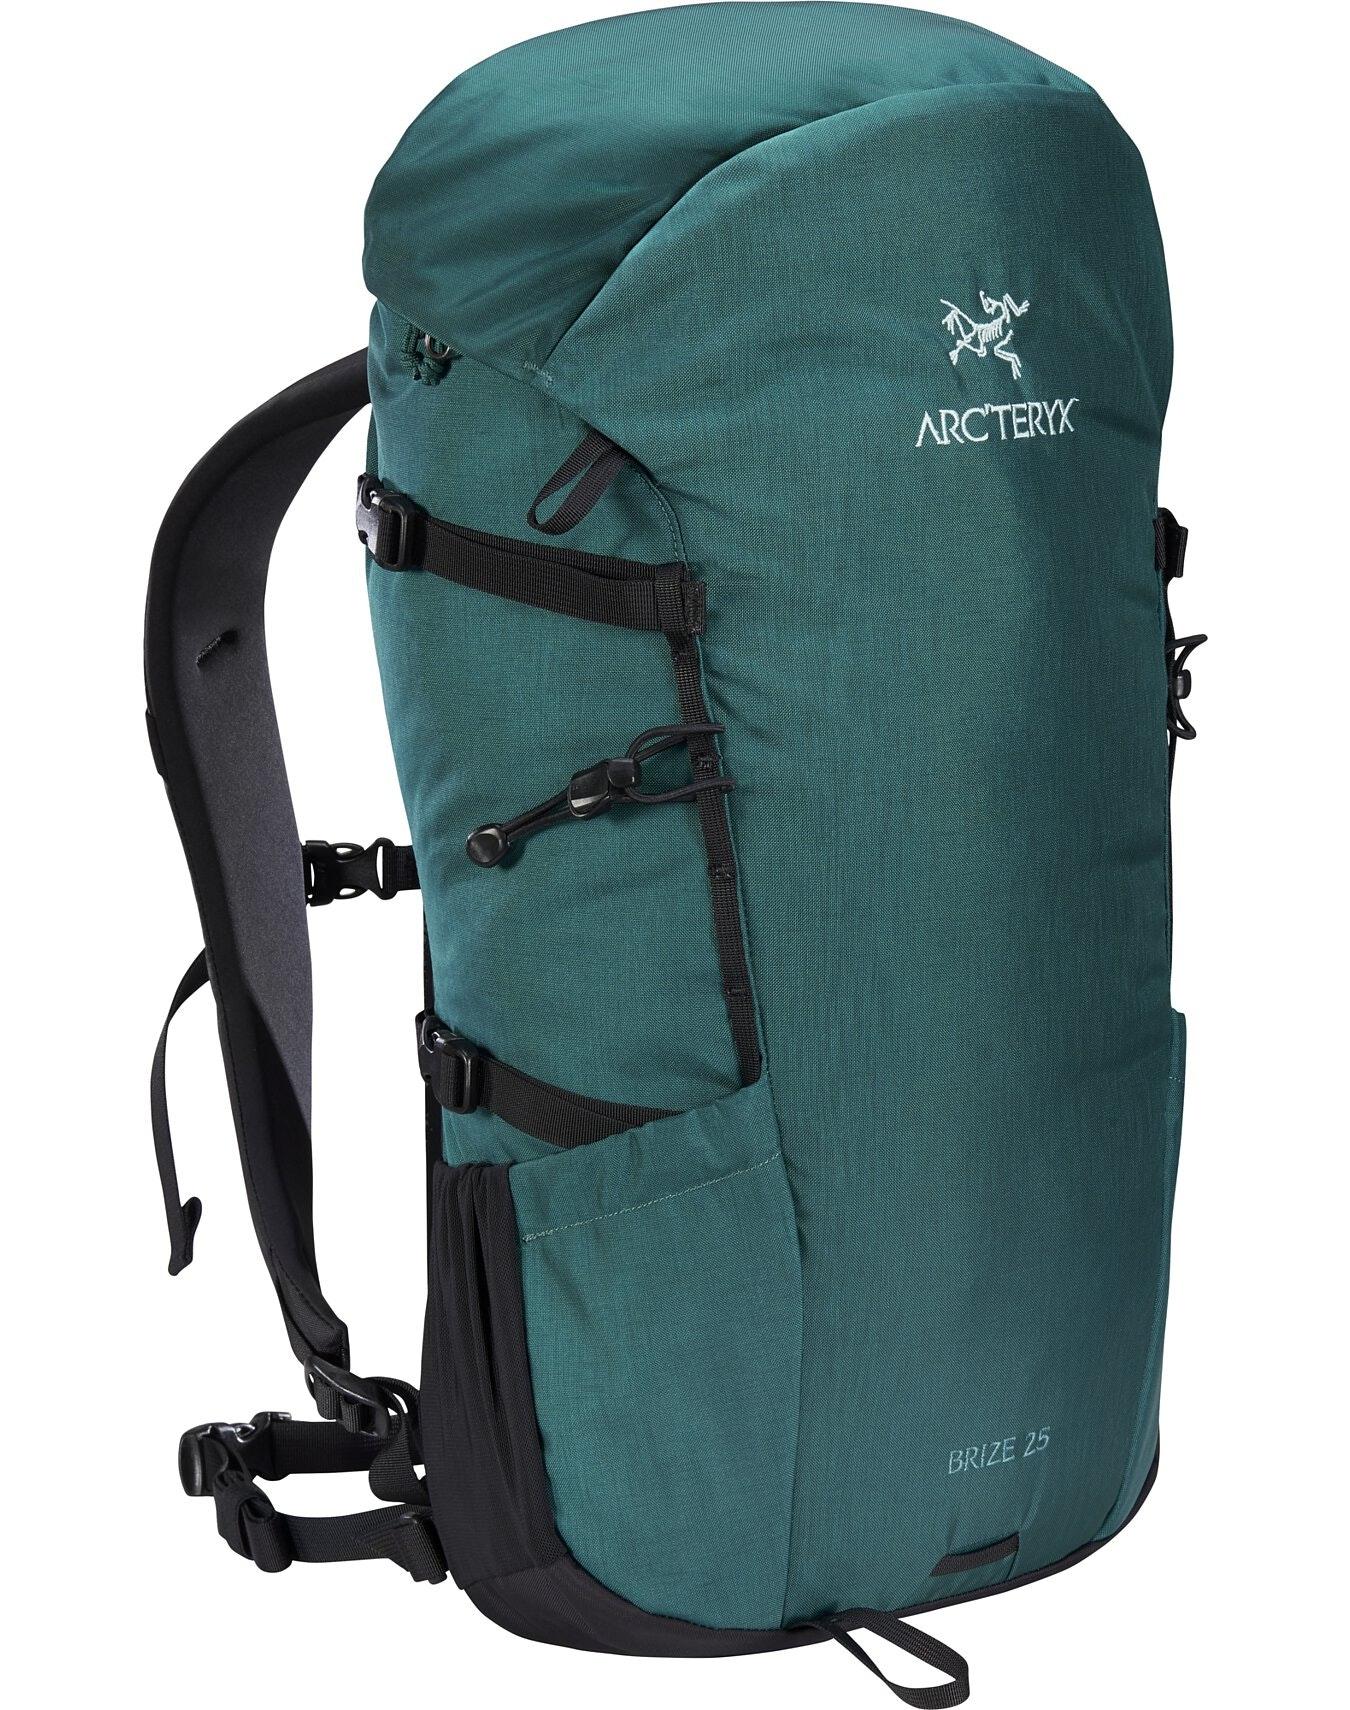 Brize 25 Backpack Arc Teryx